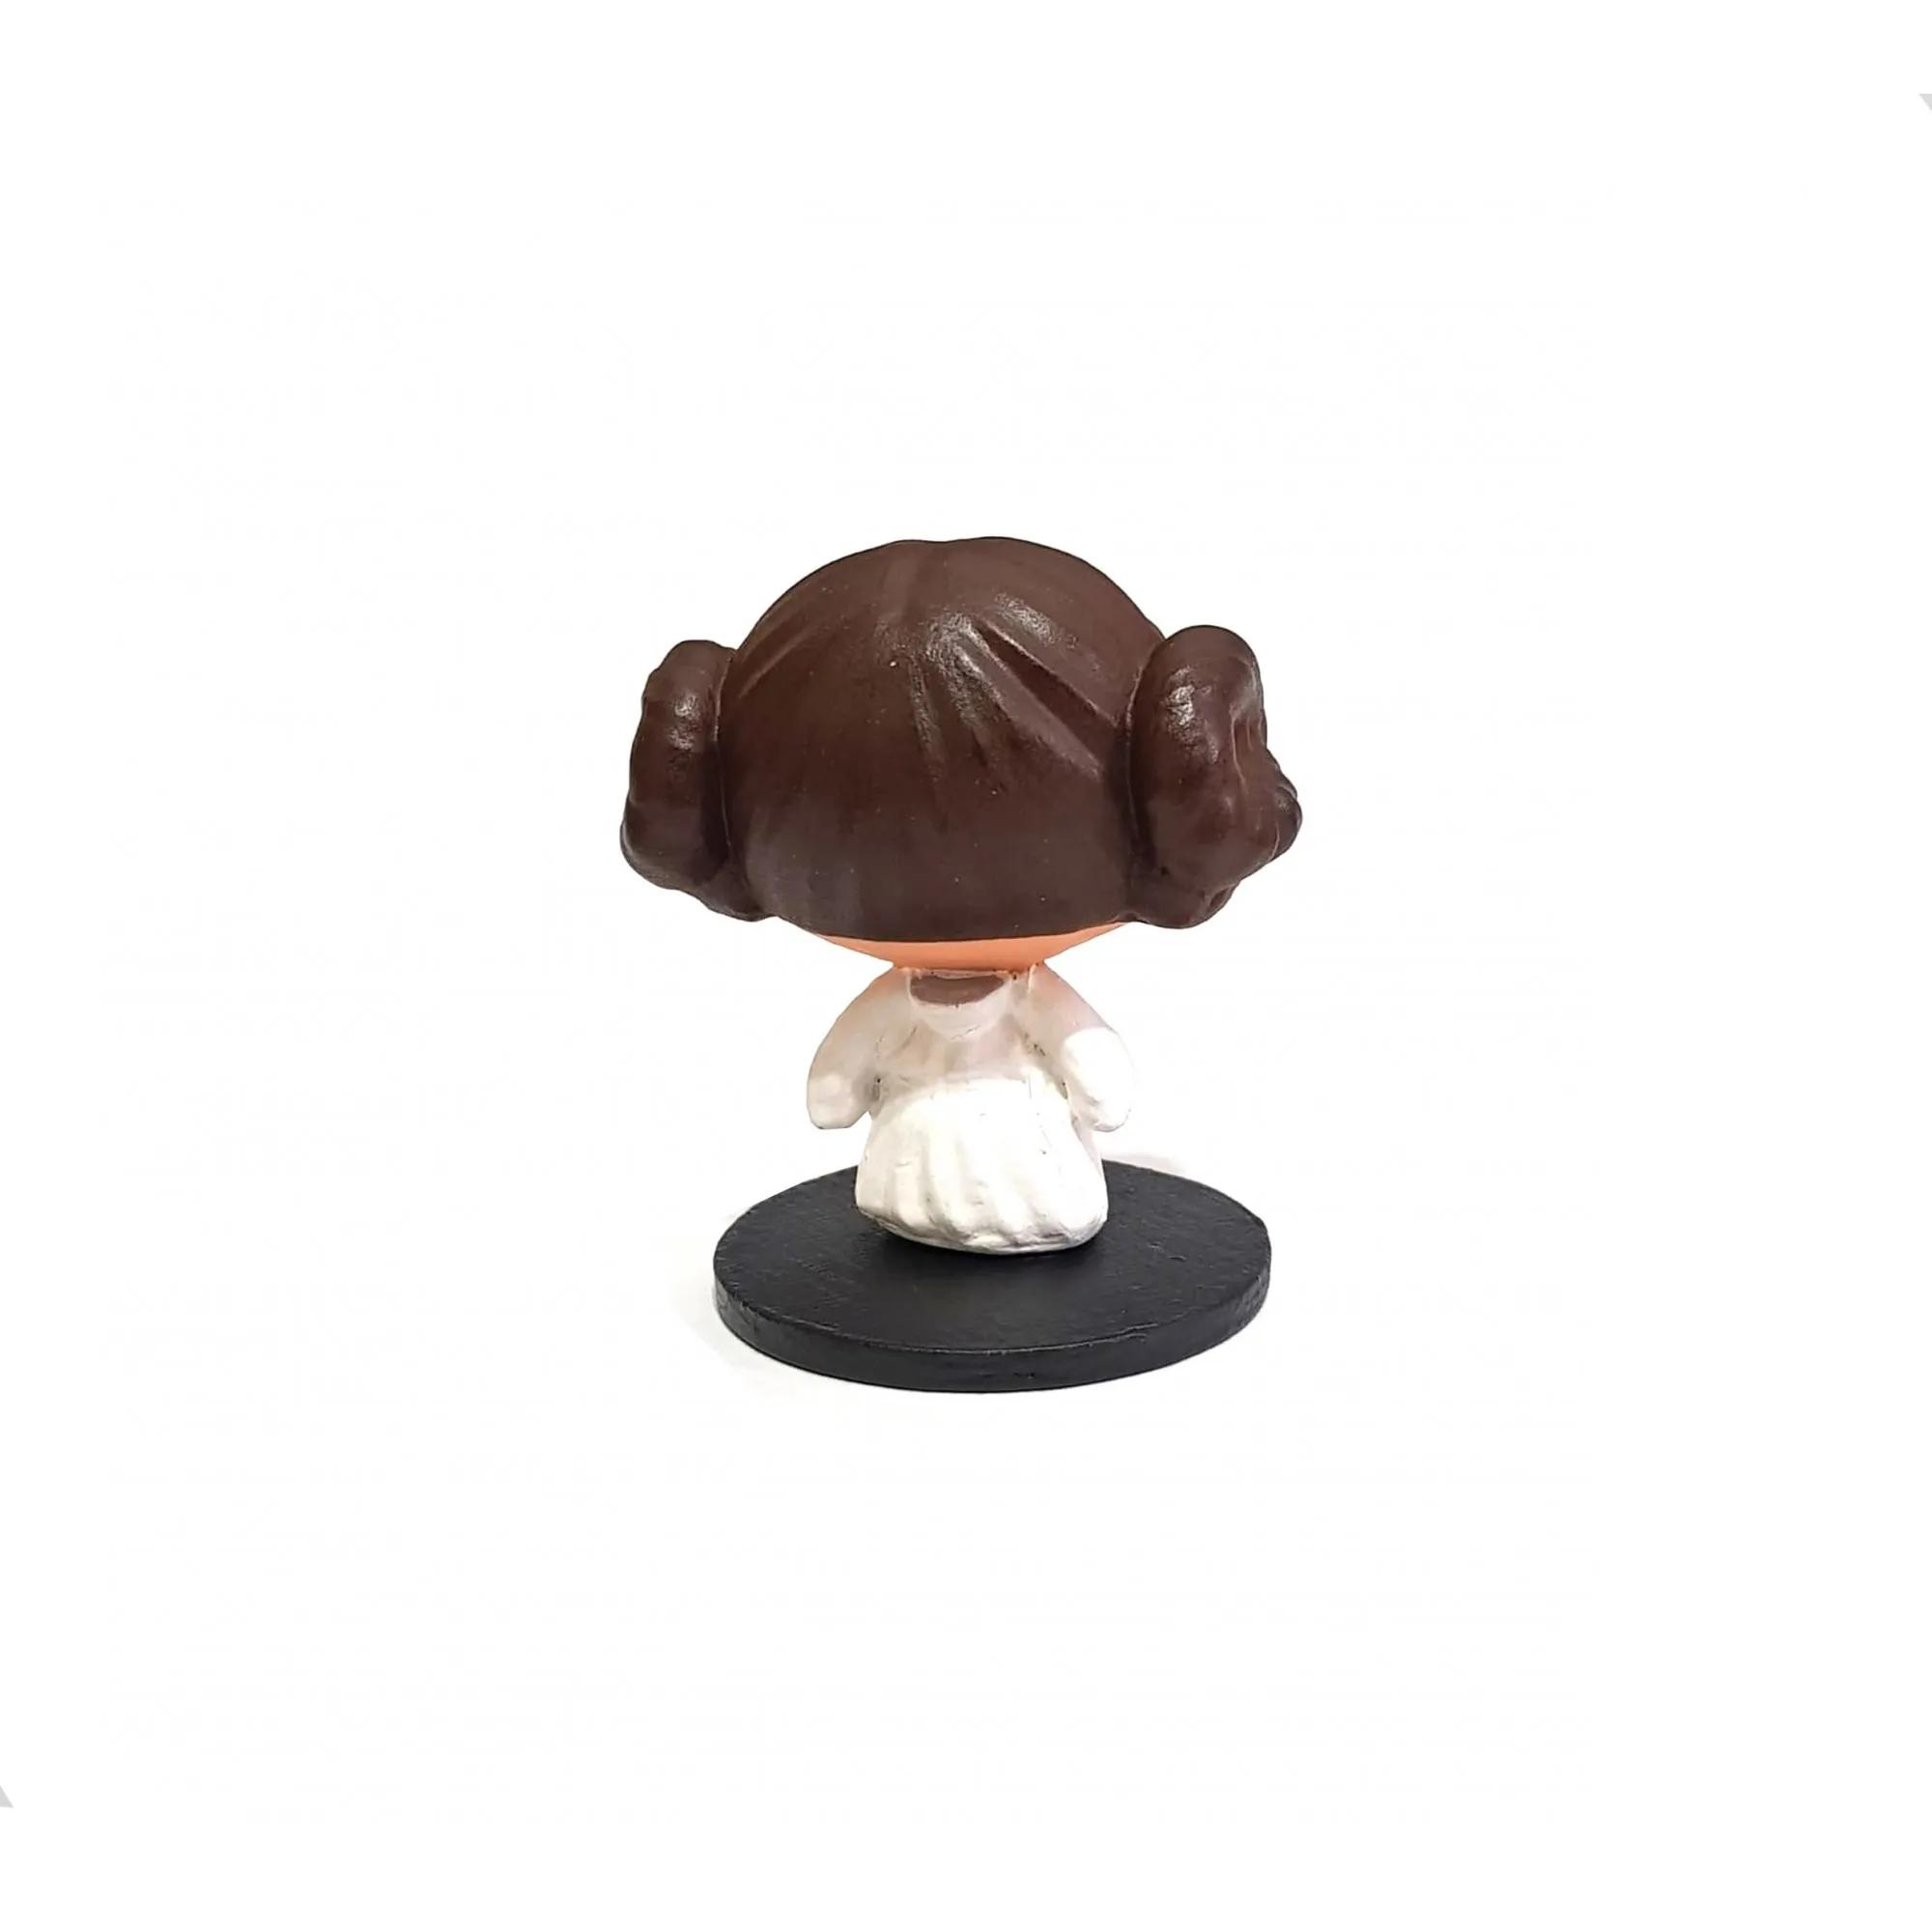 Boneco Star Wars Princesa Leia Mandalorian Novo Geek Jedi